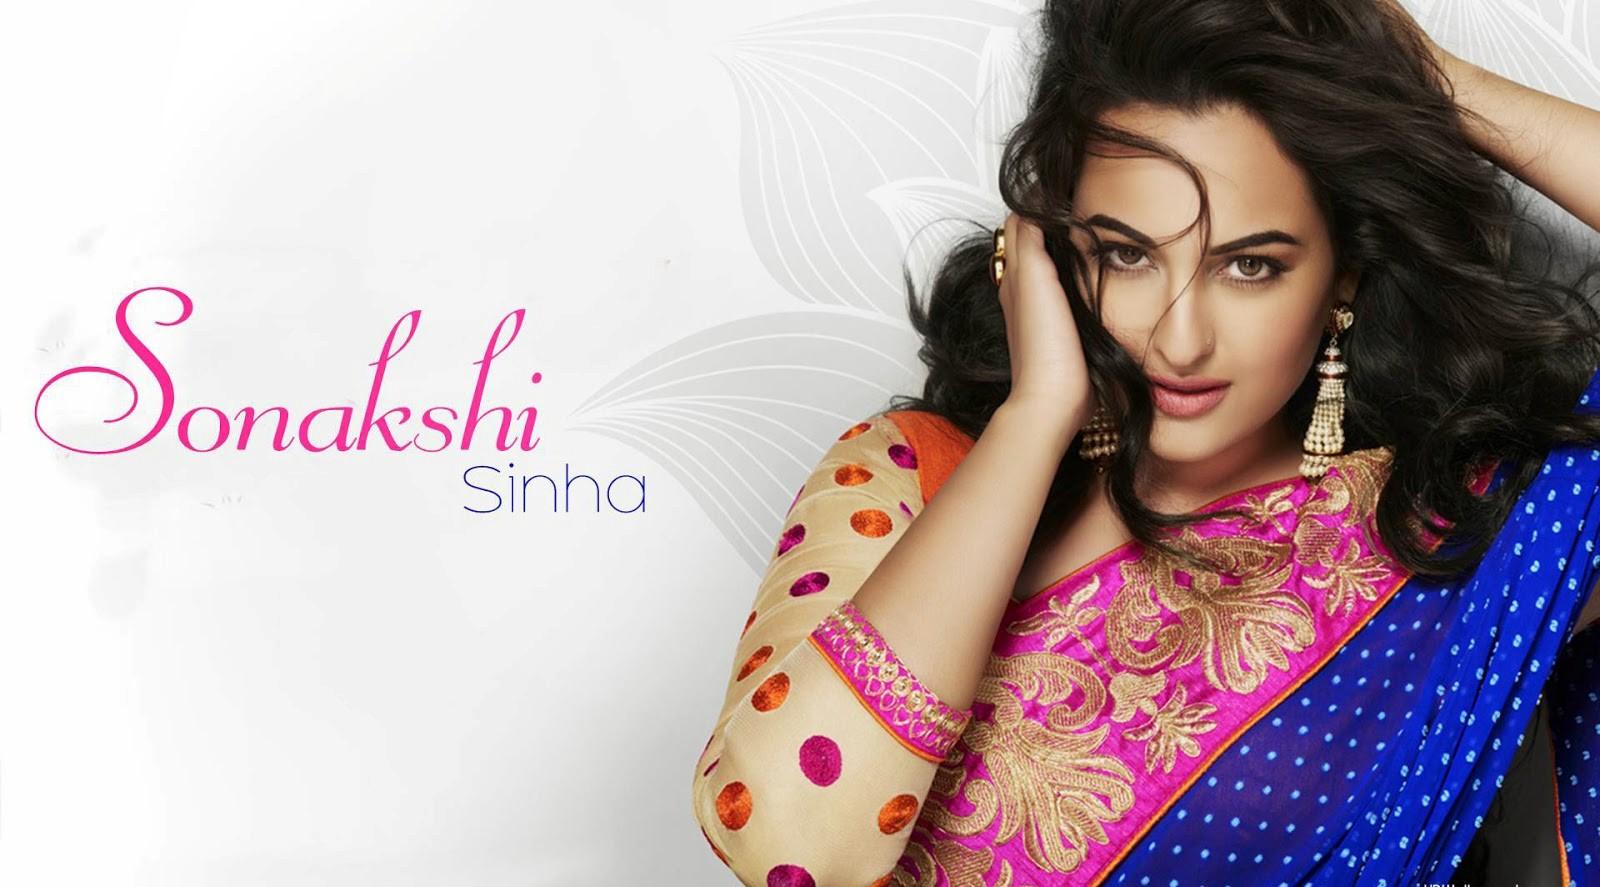 Sonakshi Sinha Hot  Sexy Hd Wallpaper  Images  Hd -4579